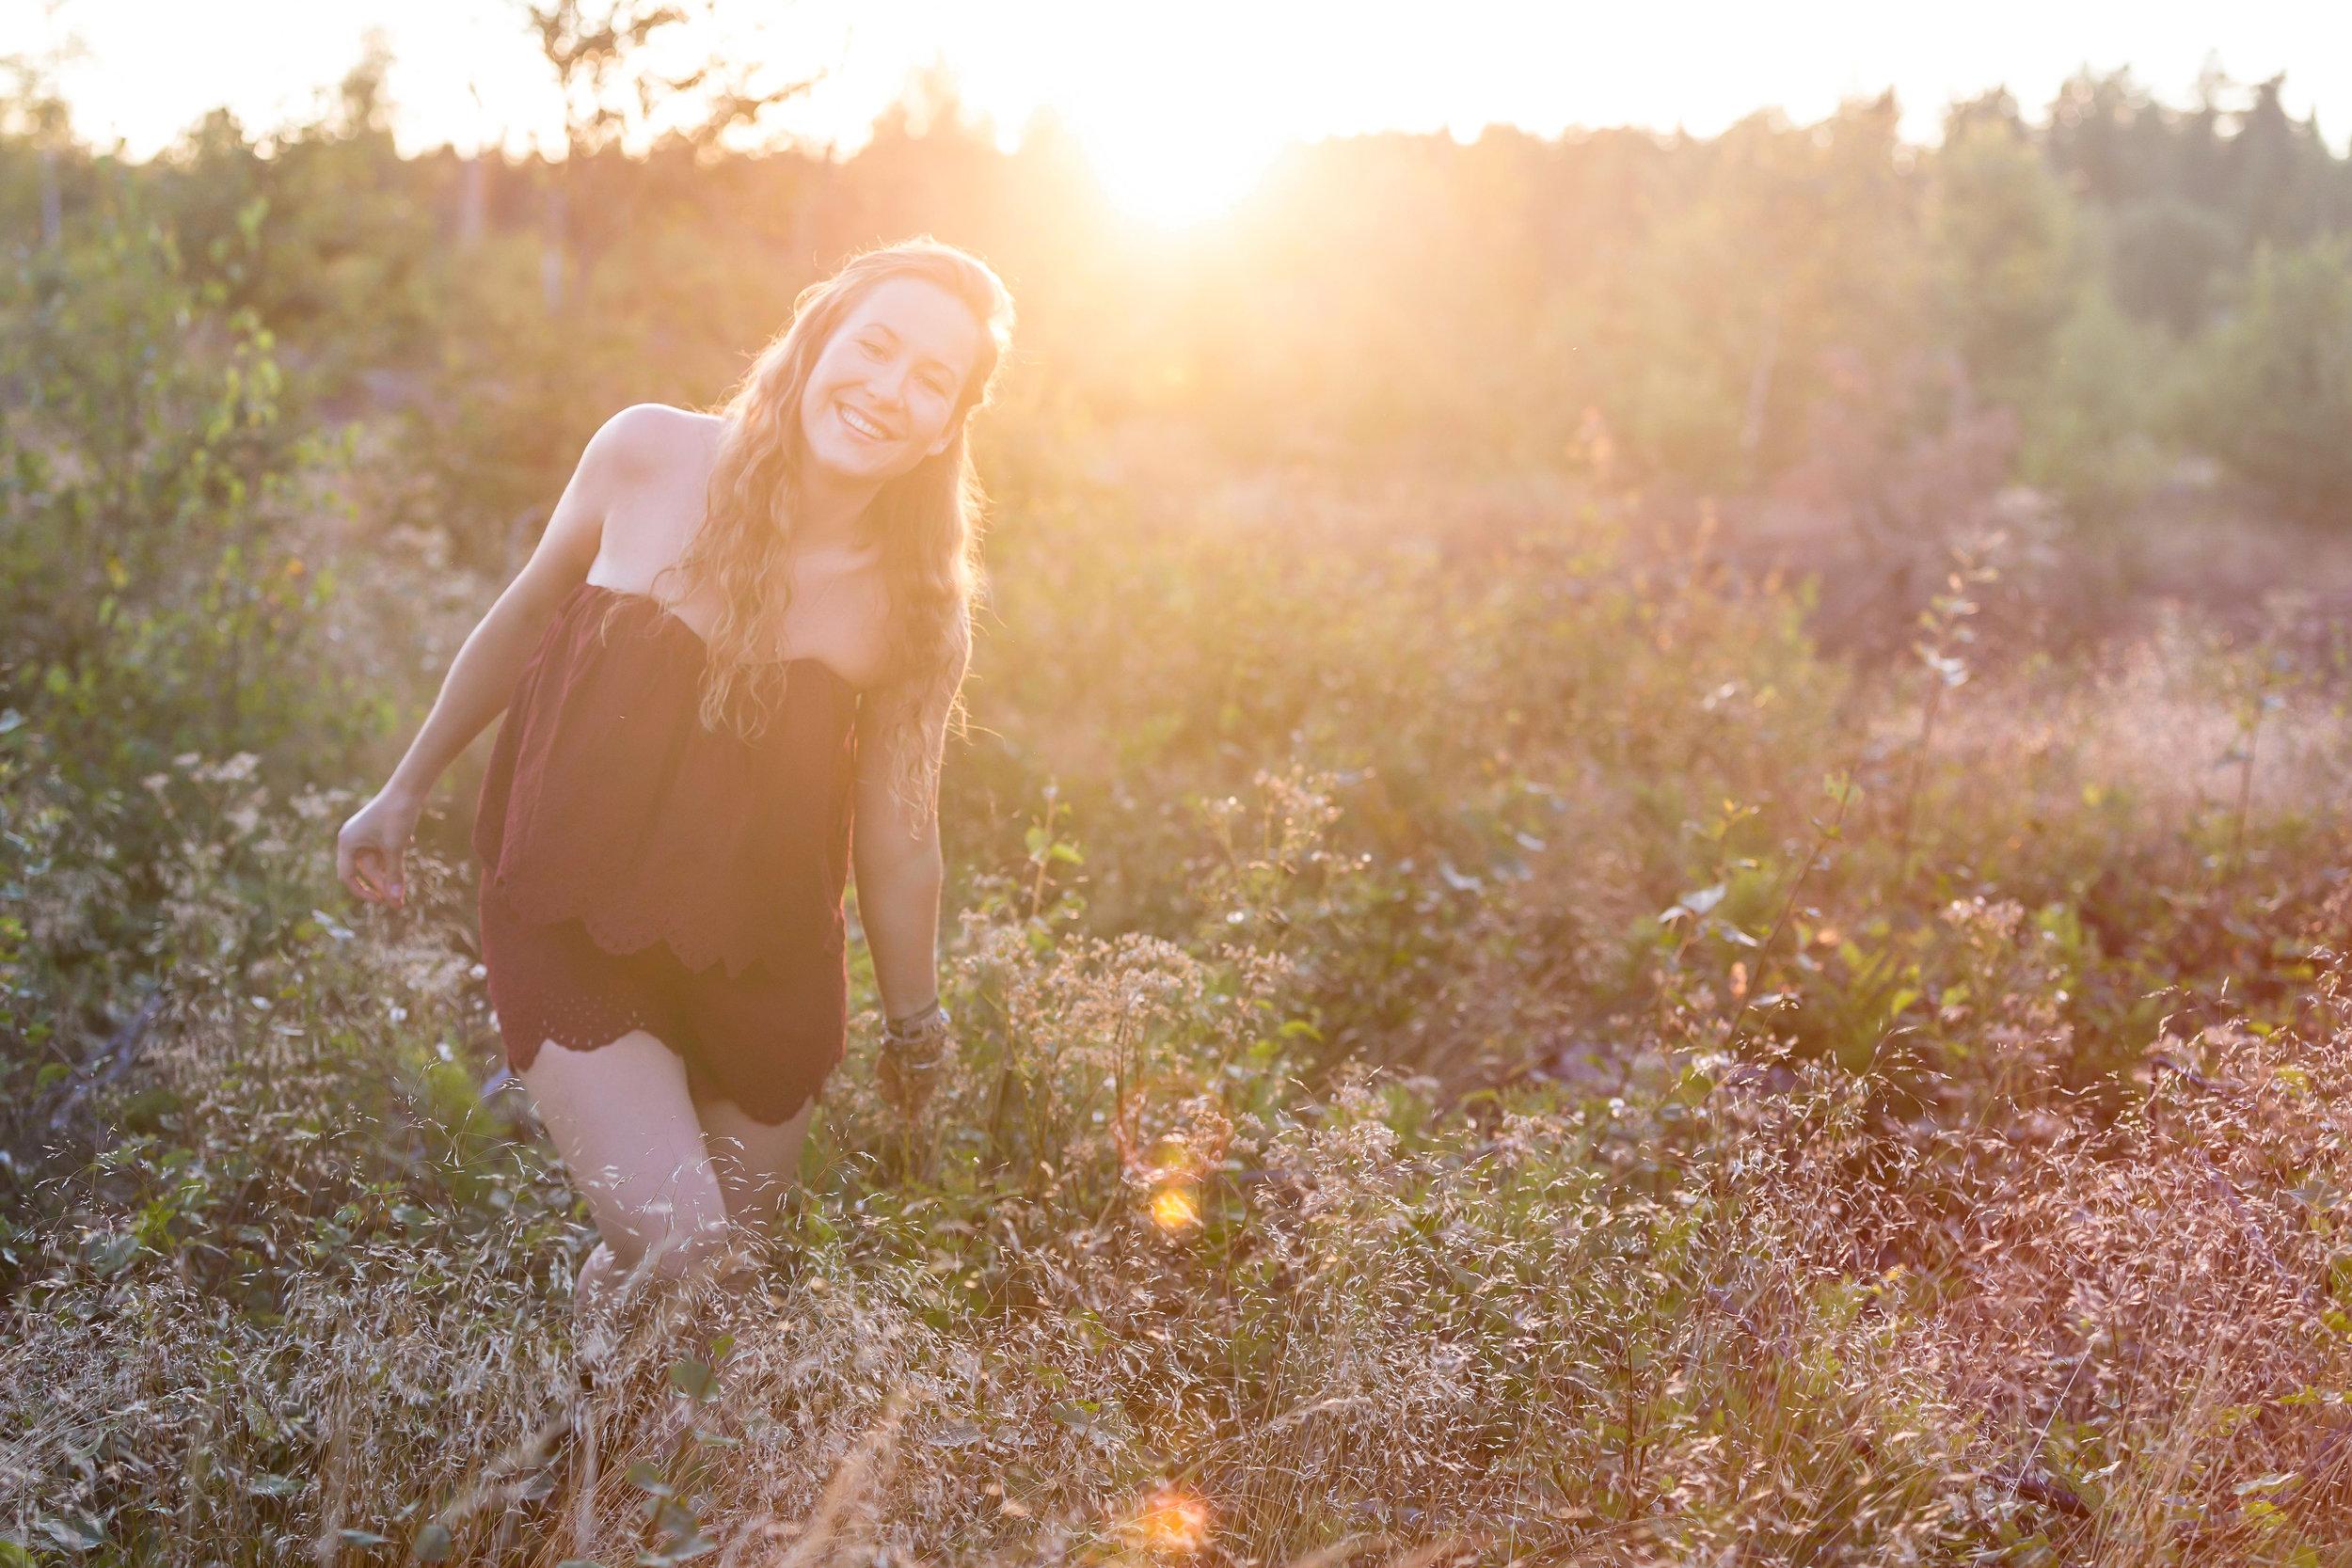 Mikaela-Nalgard-foto-tuana-20160815-0198.jpg